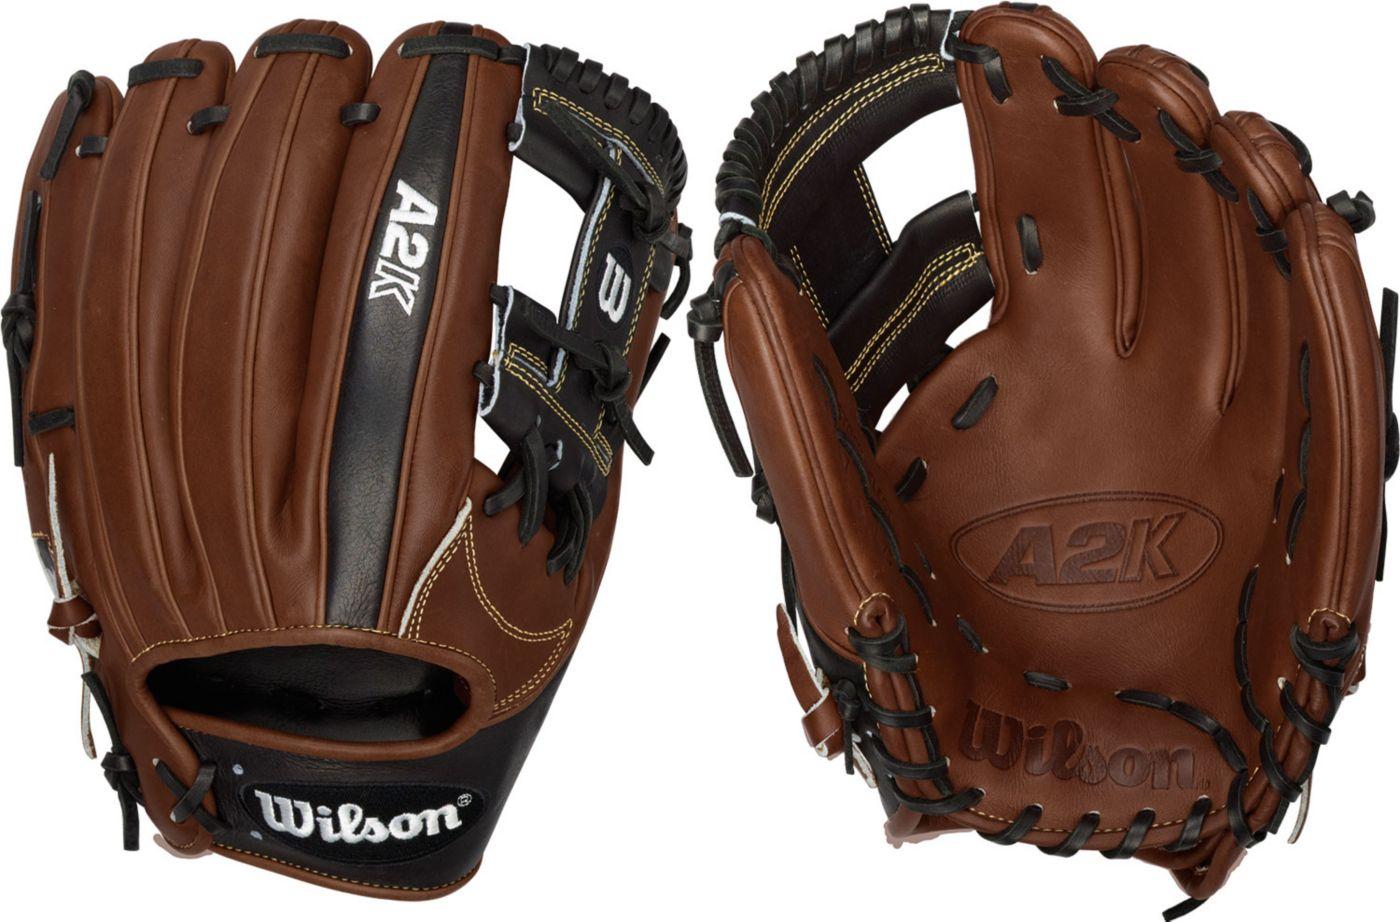 Wilson 11.75'' A2K 1787 Series Glove 2016